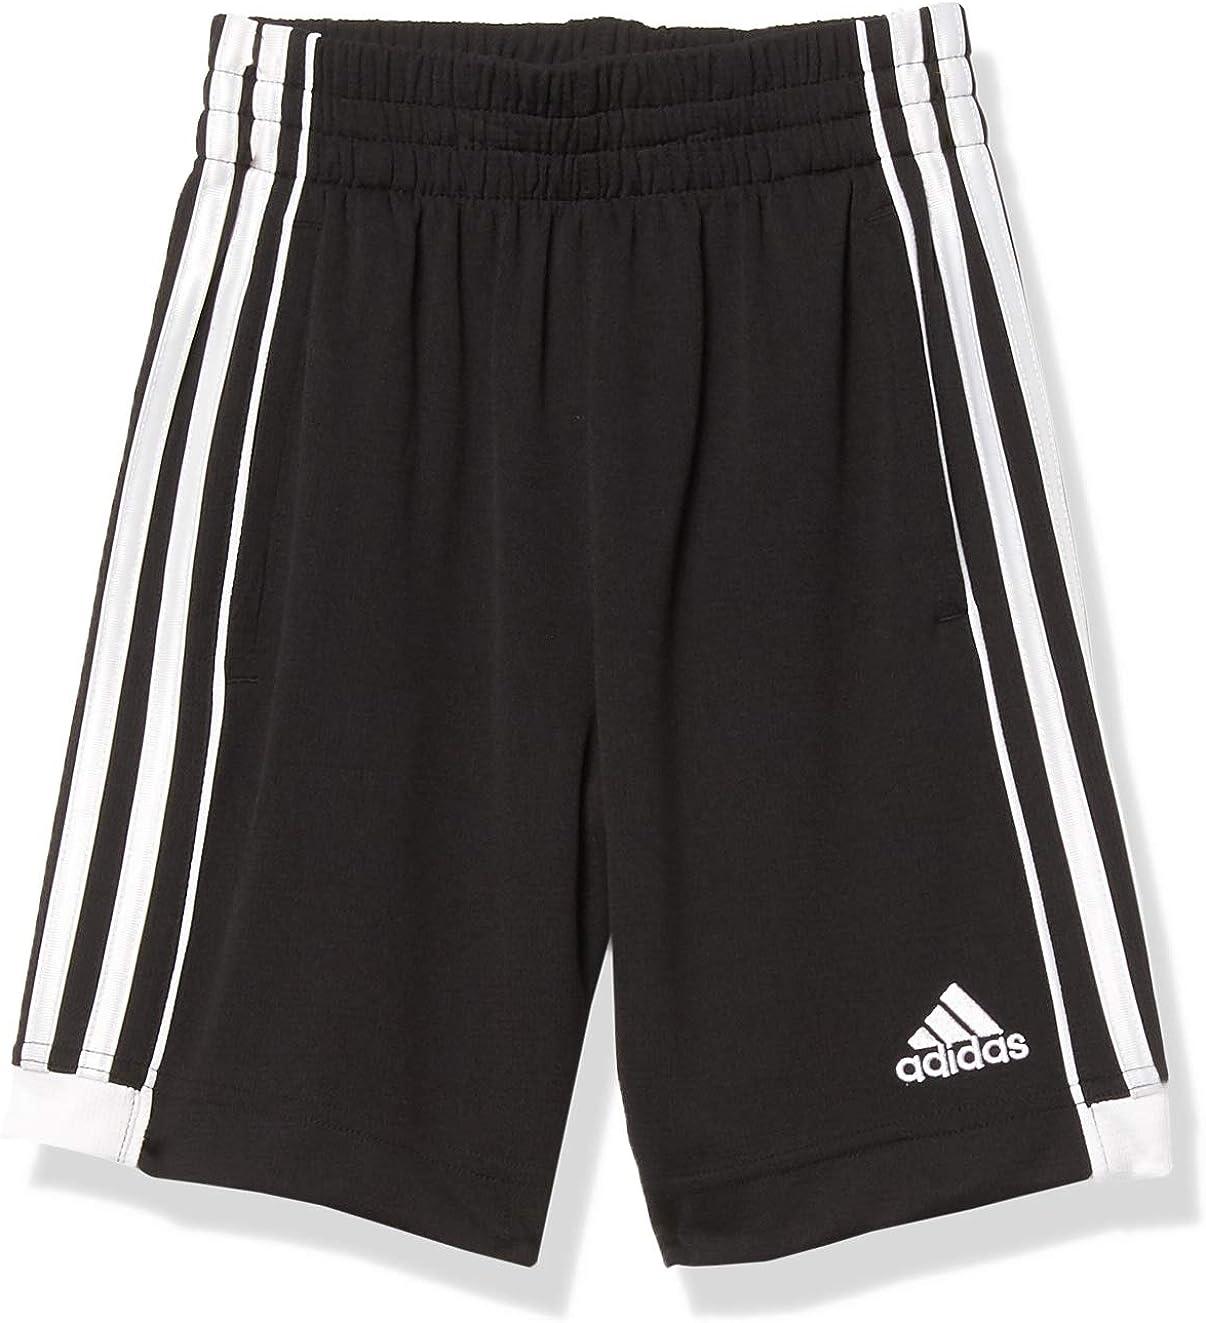 adidas Boys' Big Active Mesh Short (DISC), Speed 18 Black, XS(7)